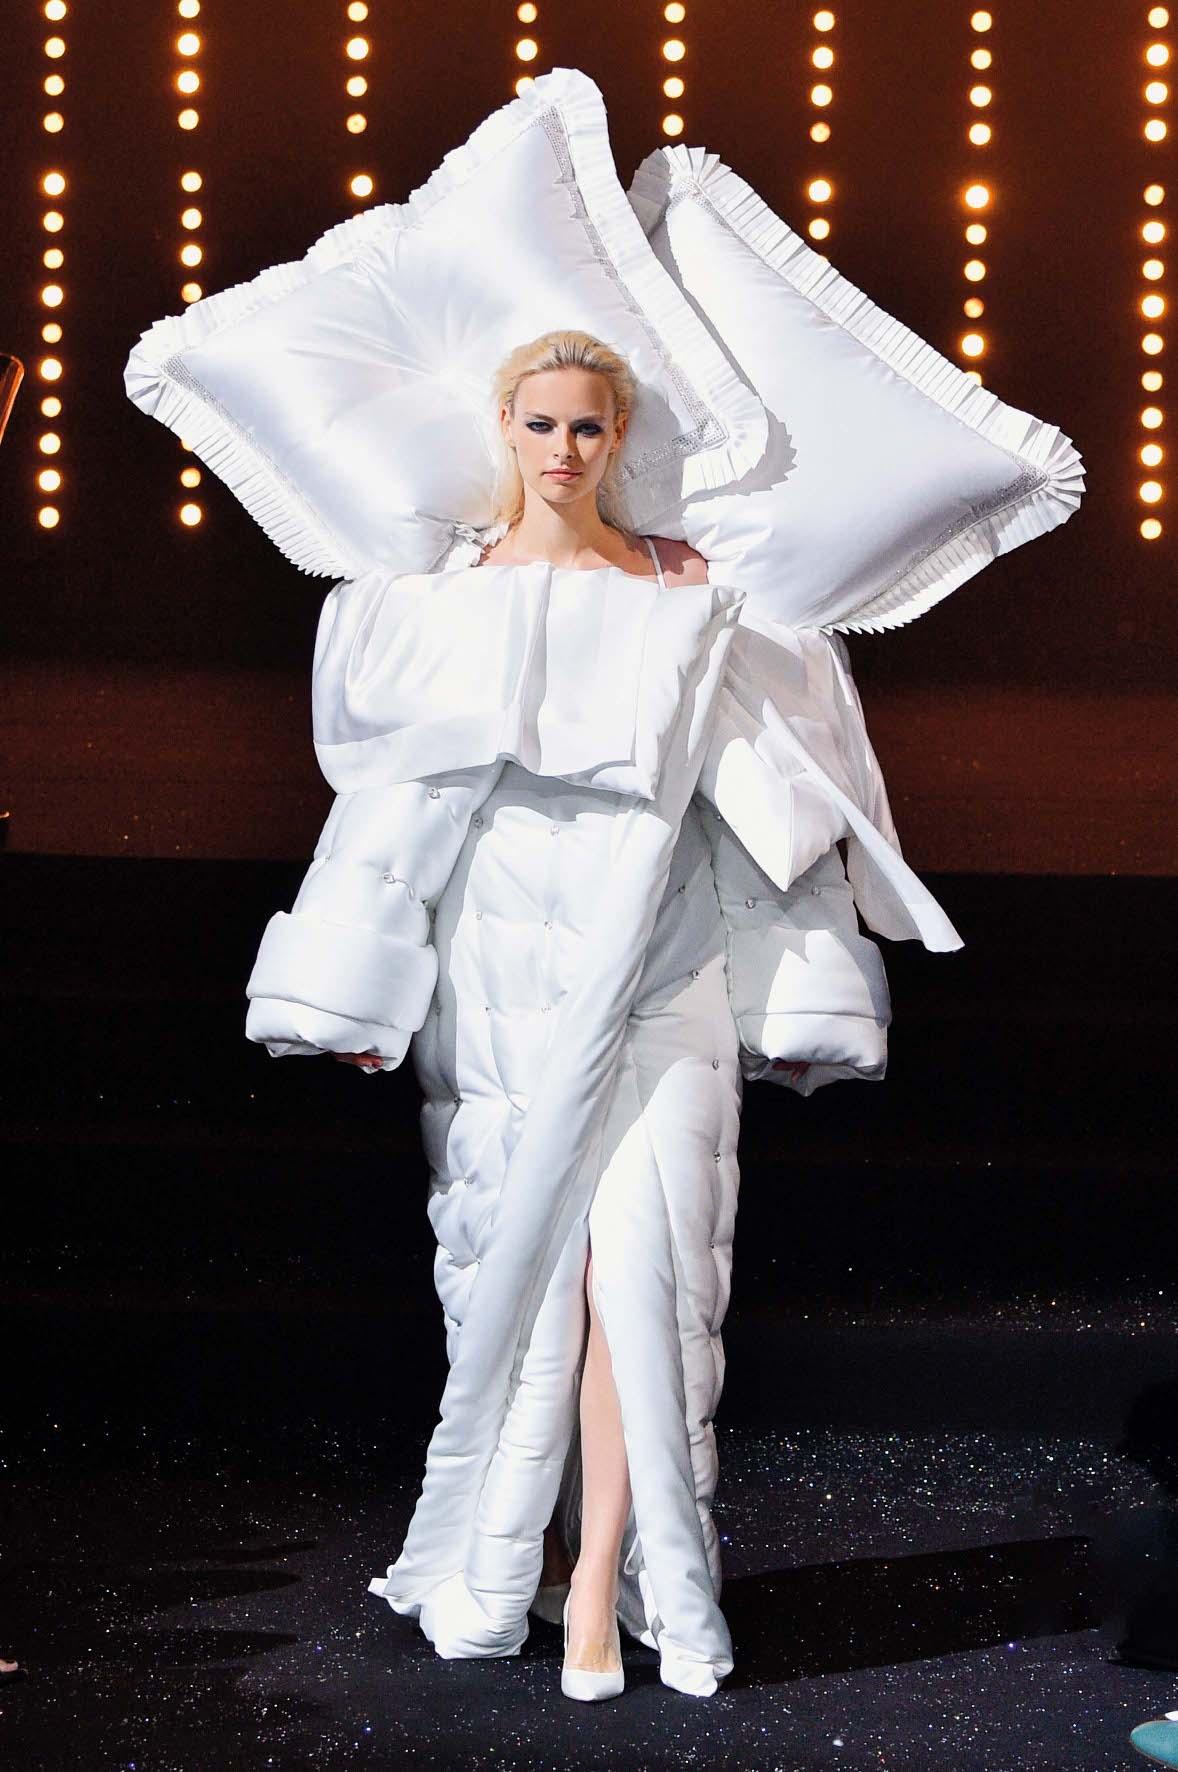 PARIS, FRANCE - JULY 04:  A model walks the runway during the Viktor